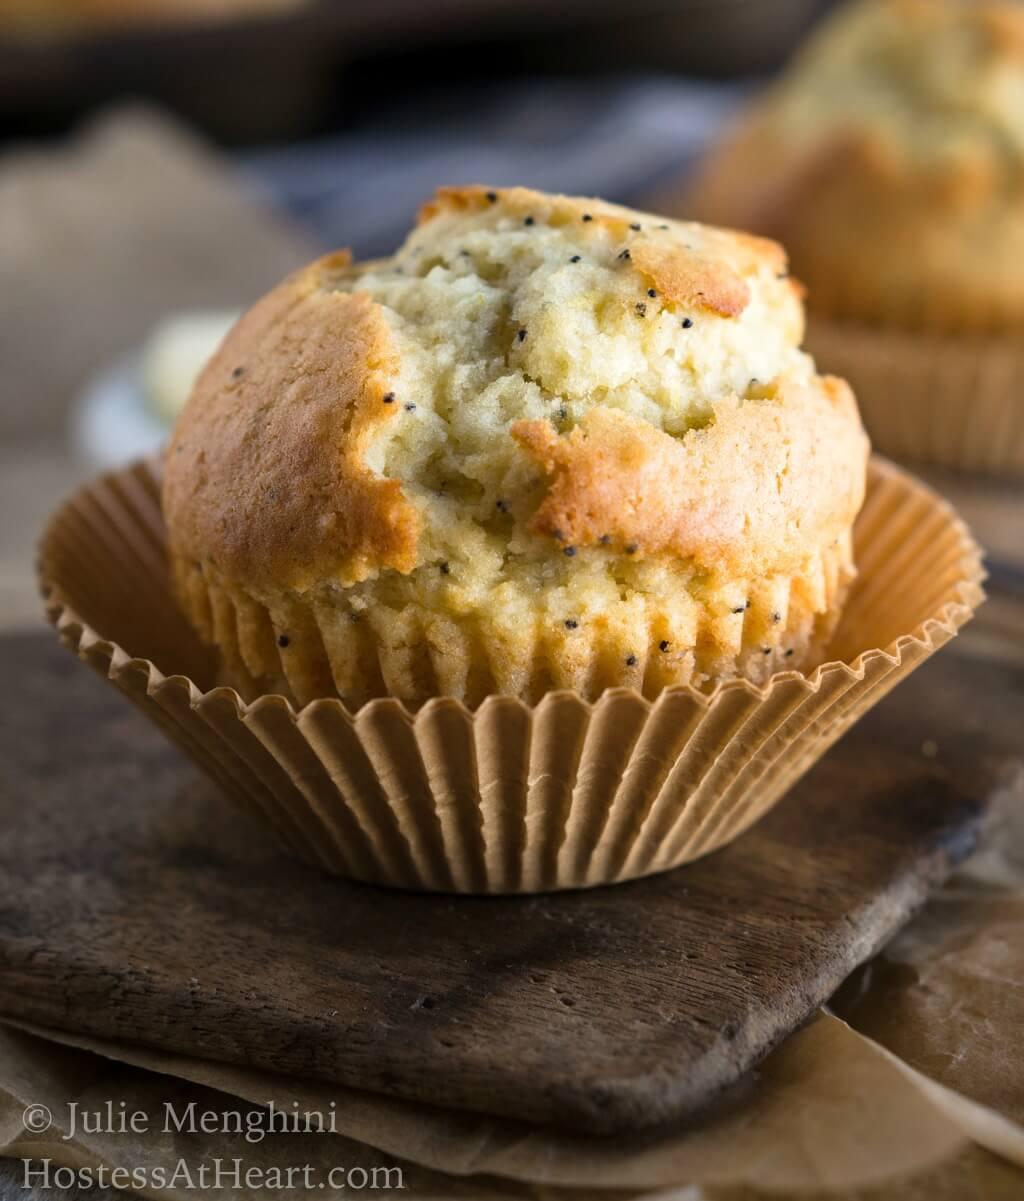 Homemade Basic Muffin Recipe - A Family Favorite